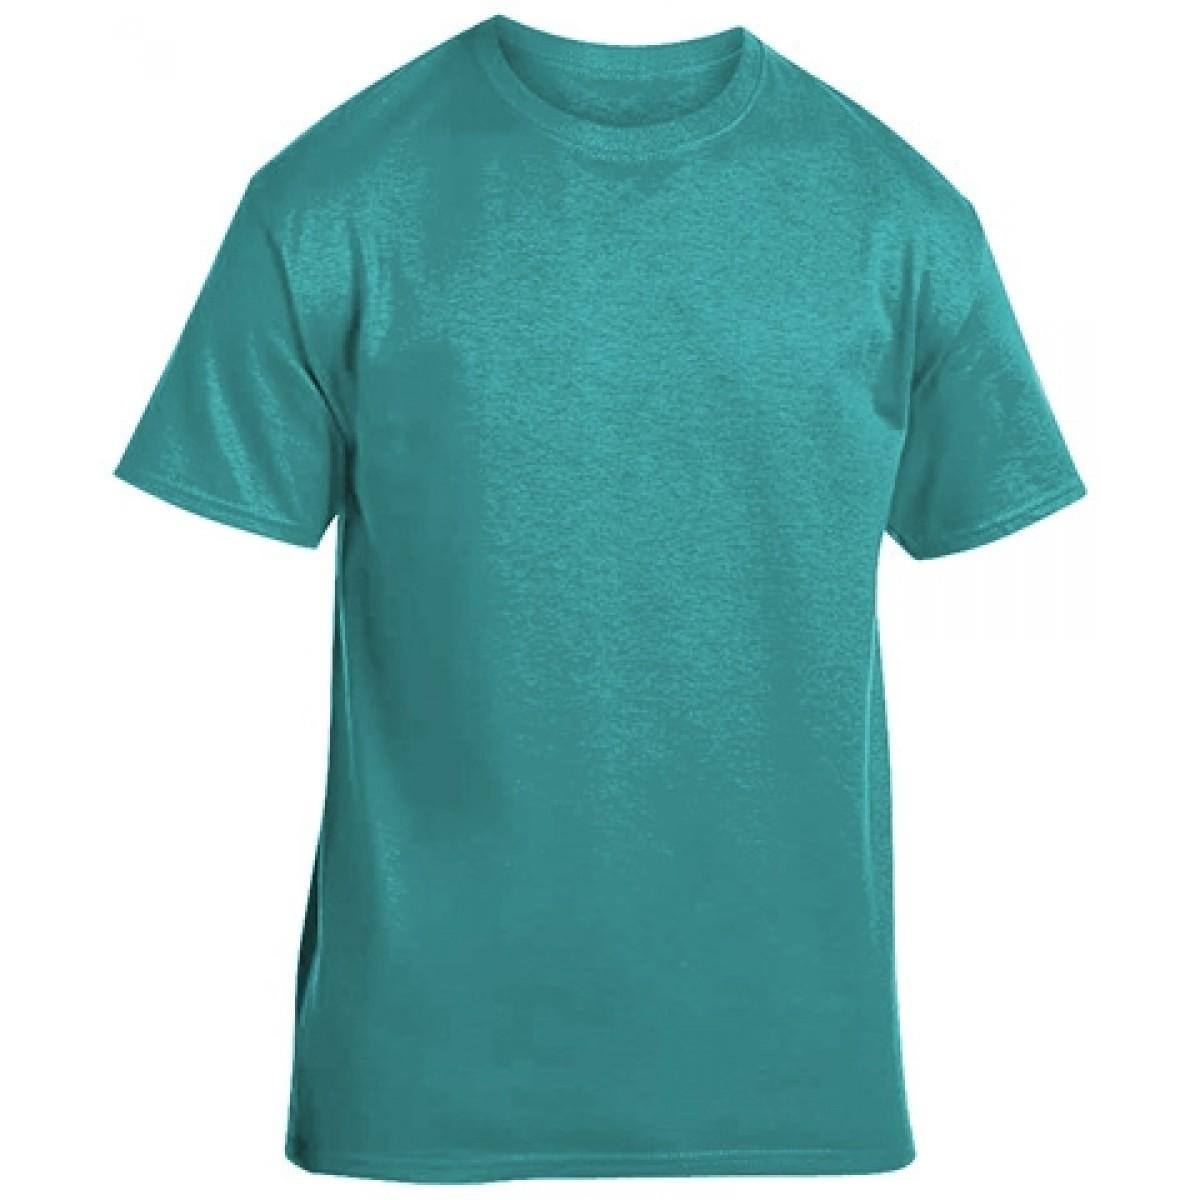 Soft 100% Cotton T-Shirt-Jade-YM